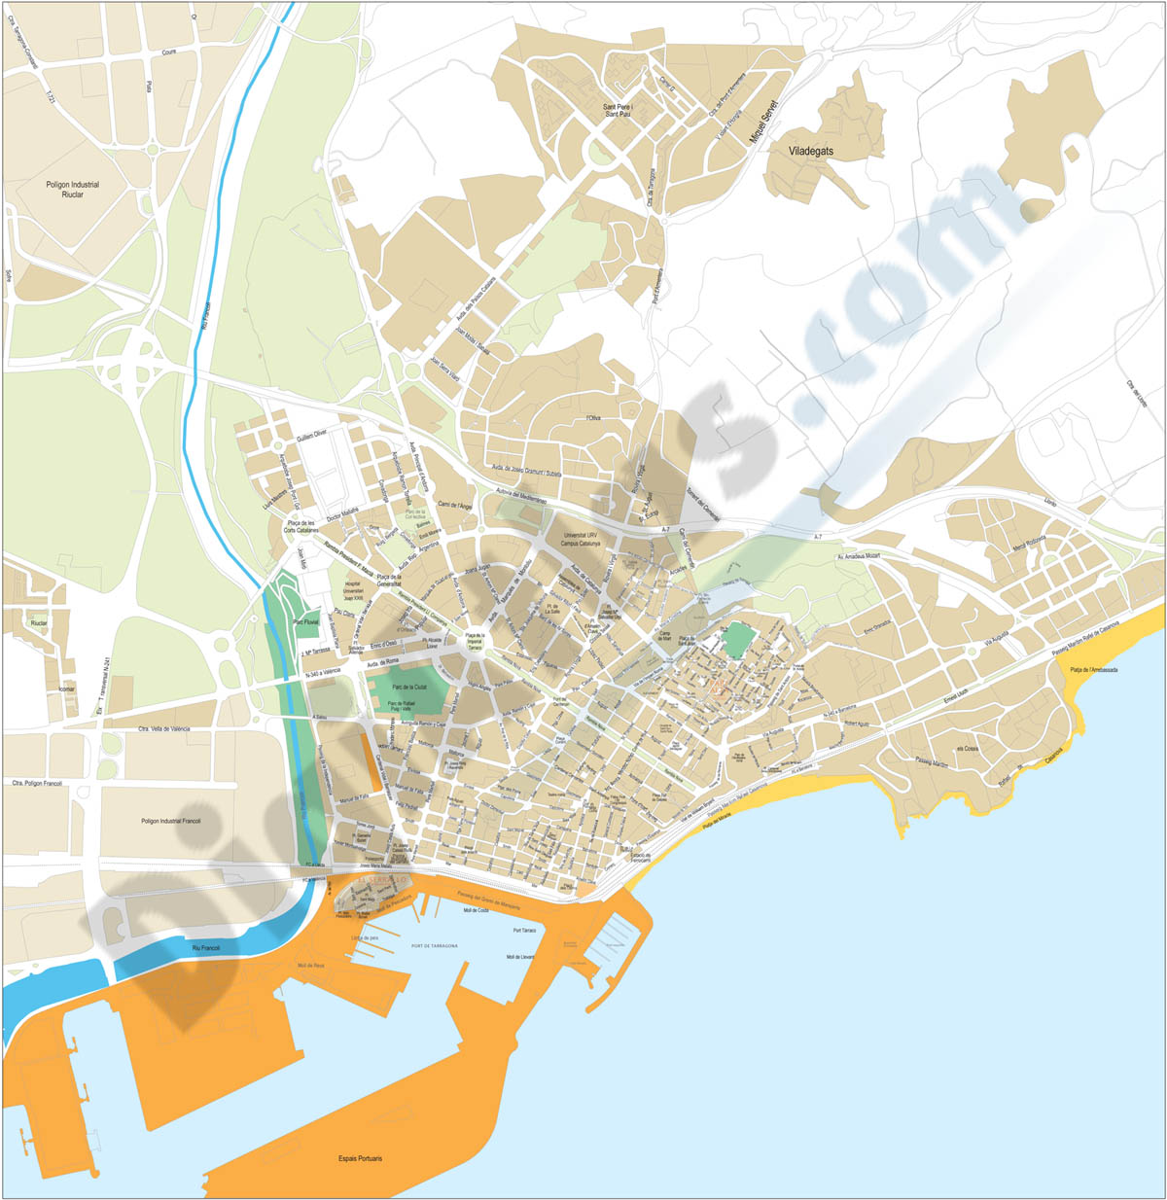 Tarragona - city map of the center